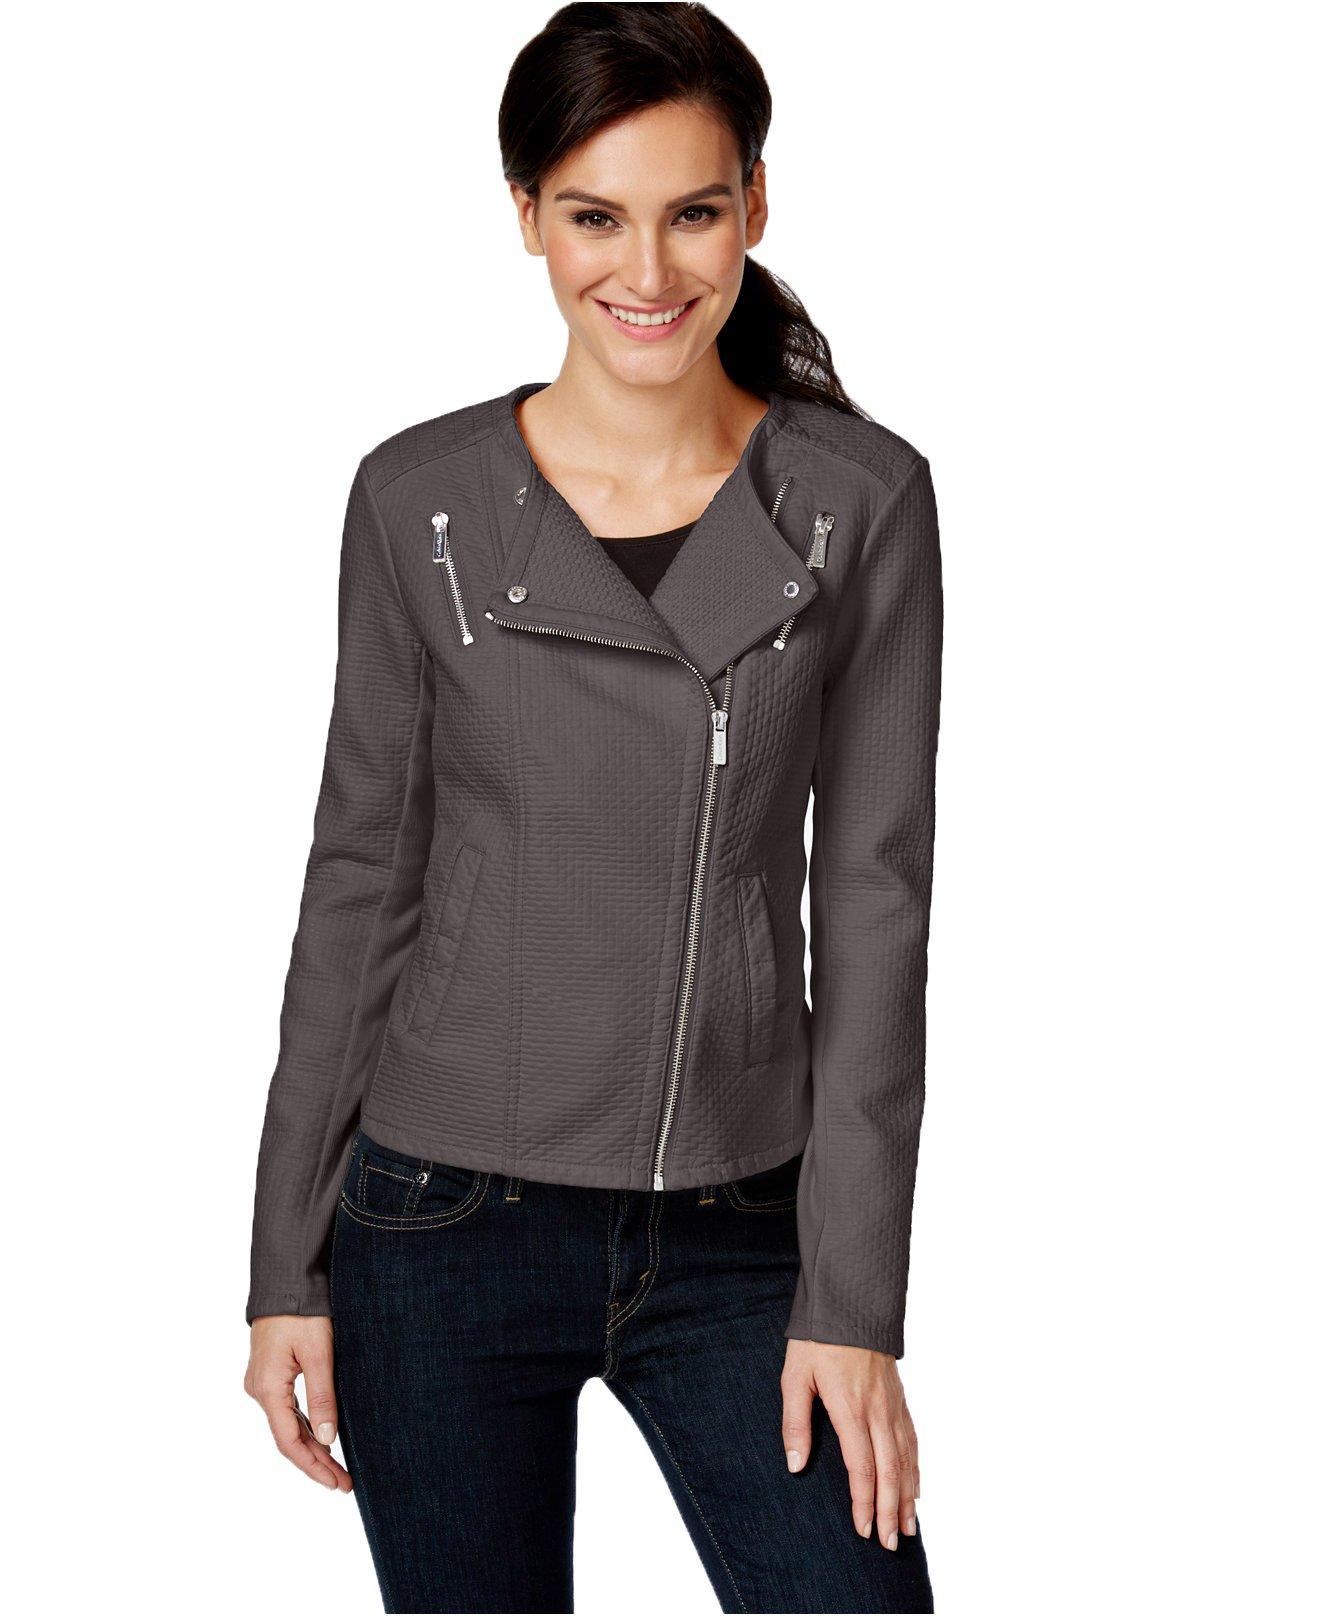 Calvin Klein Women's Faux-Leather Textured Moto Jacket (Medium, Charcoal)